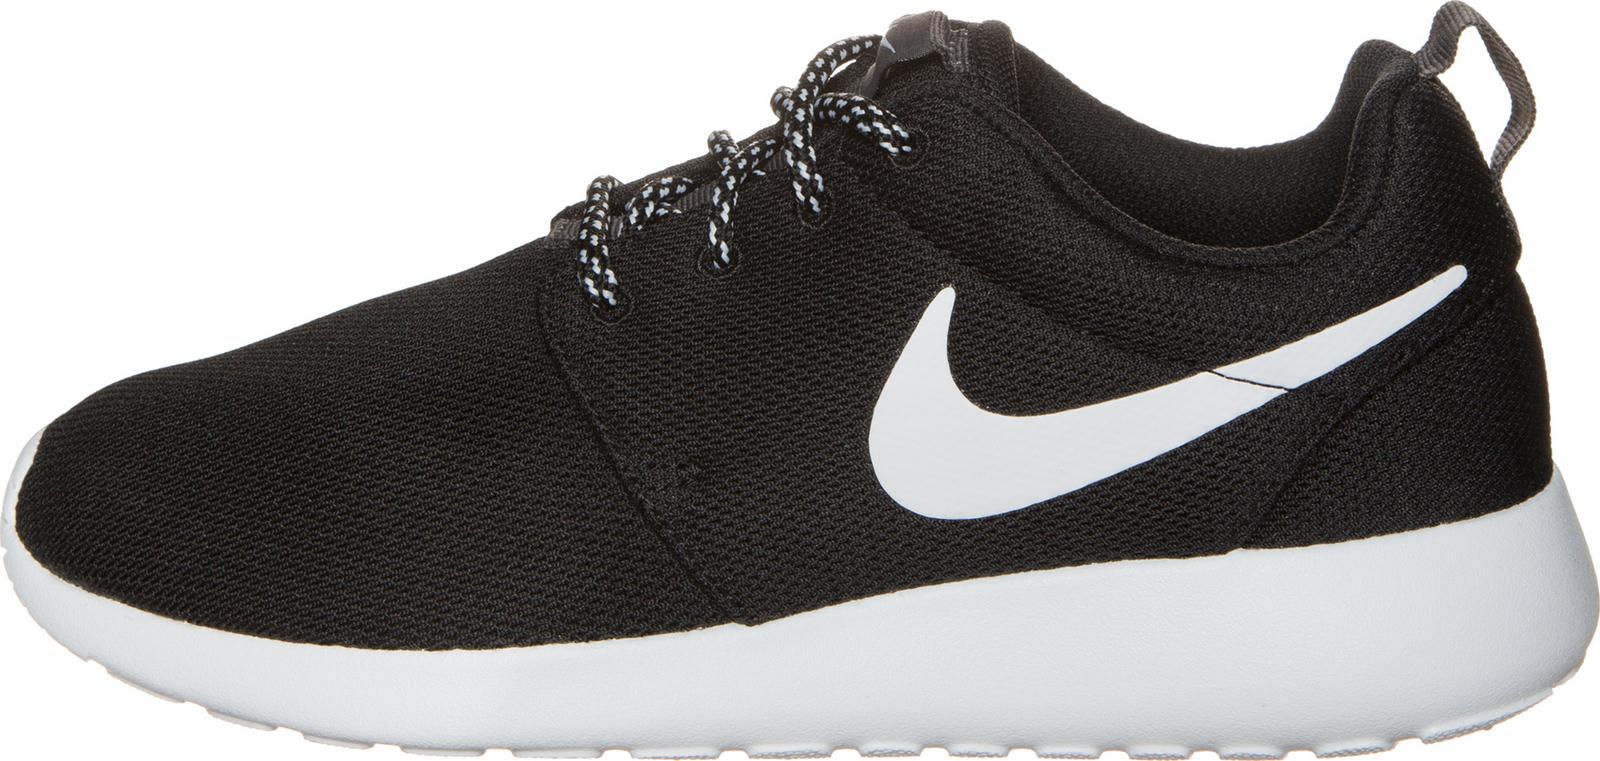 Nike Roshe One Fashion 844994 002 Skroutz.gr